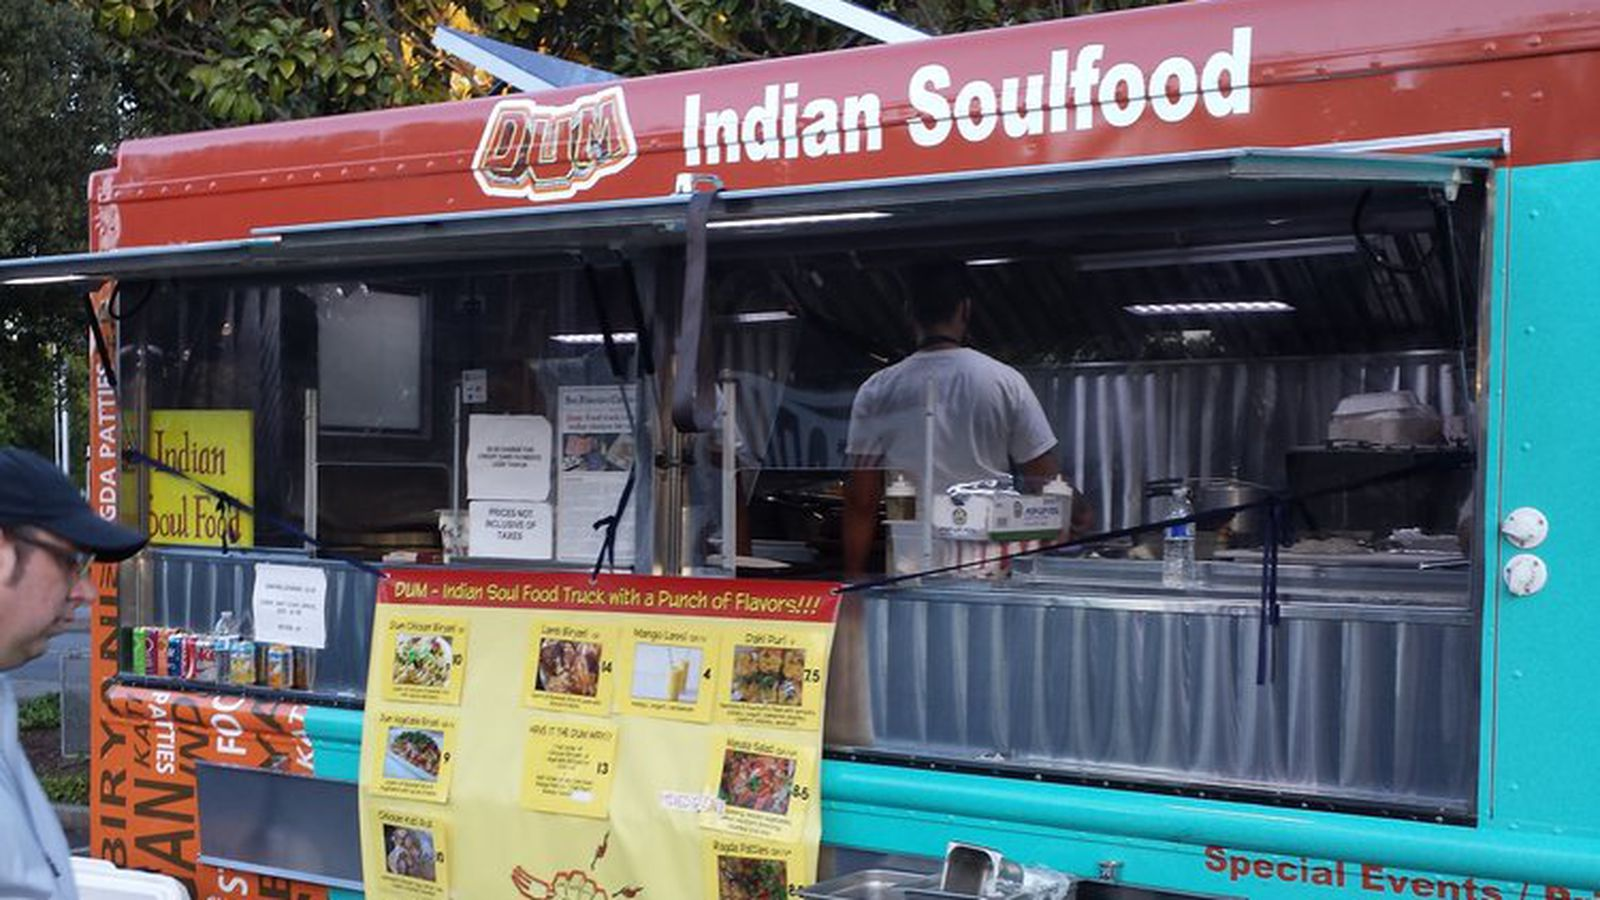 Dum Indian Soul Food Hours